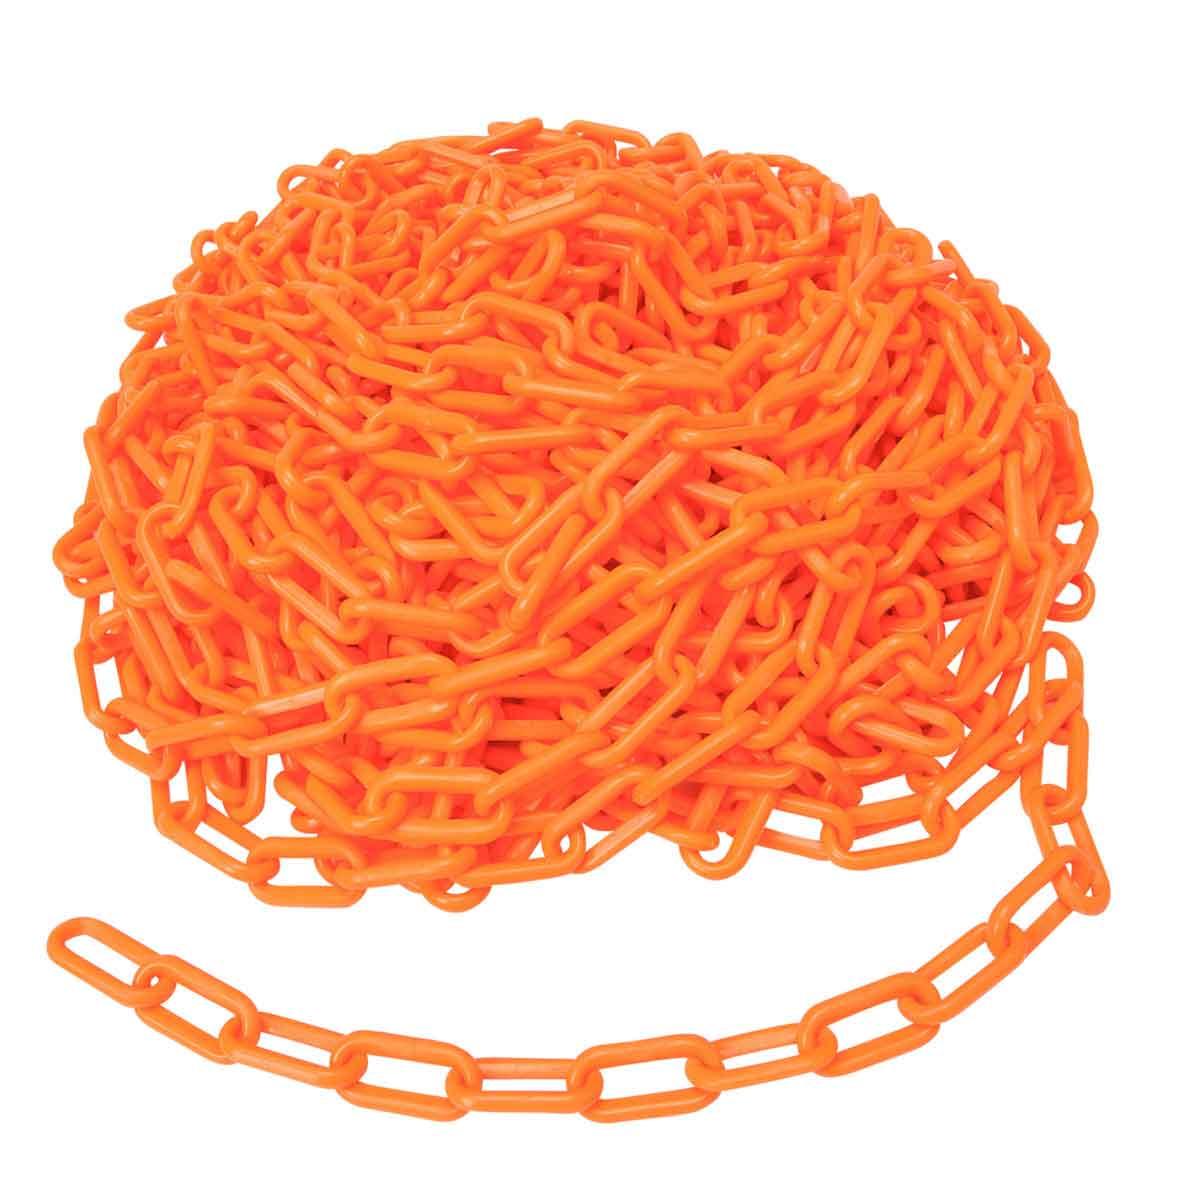 Brady® BradyLink® 78238 Warning Chain, 2 in, 100 ft L, Yellow, Polyethylene